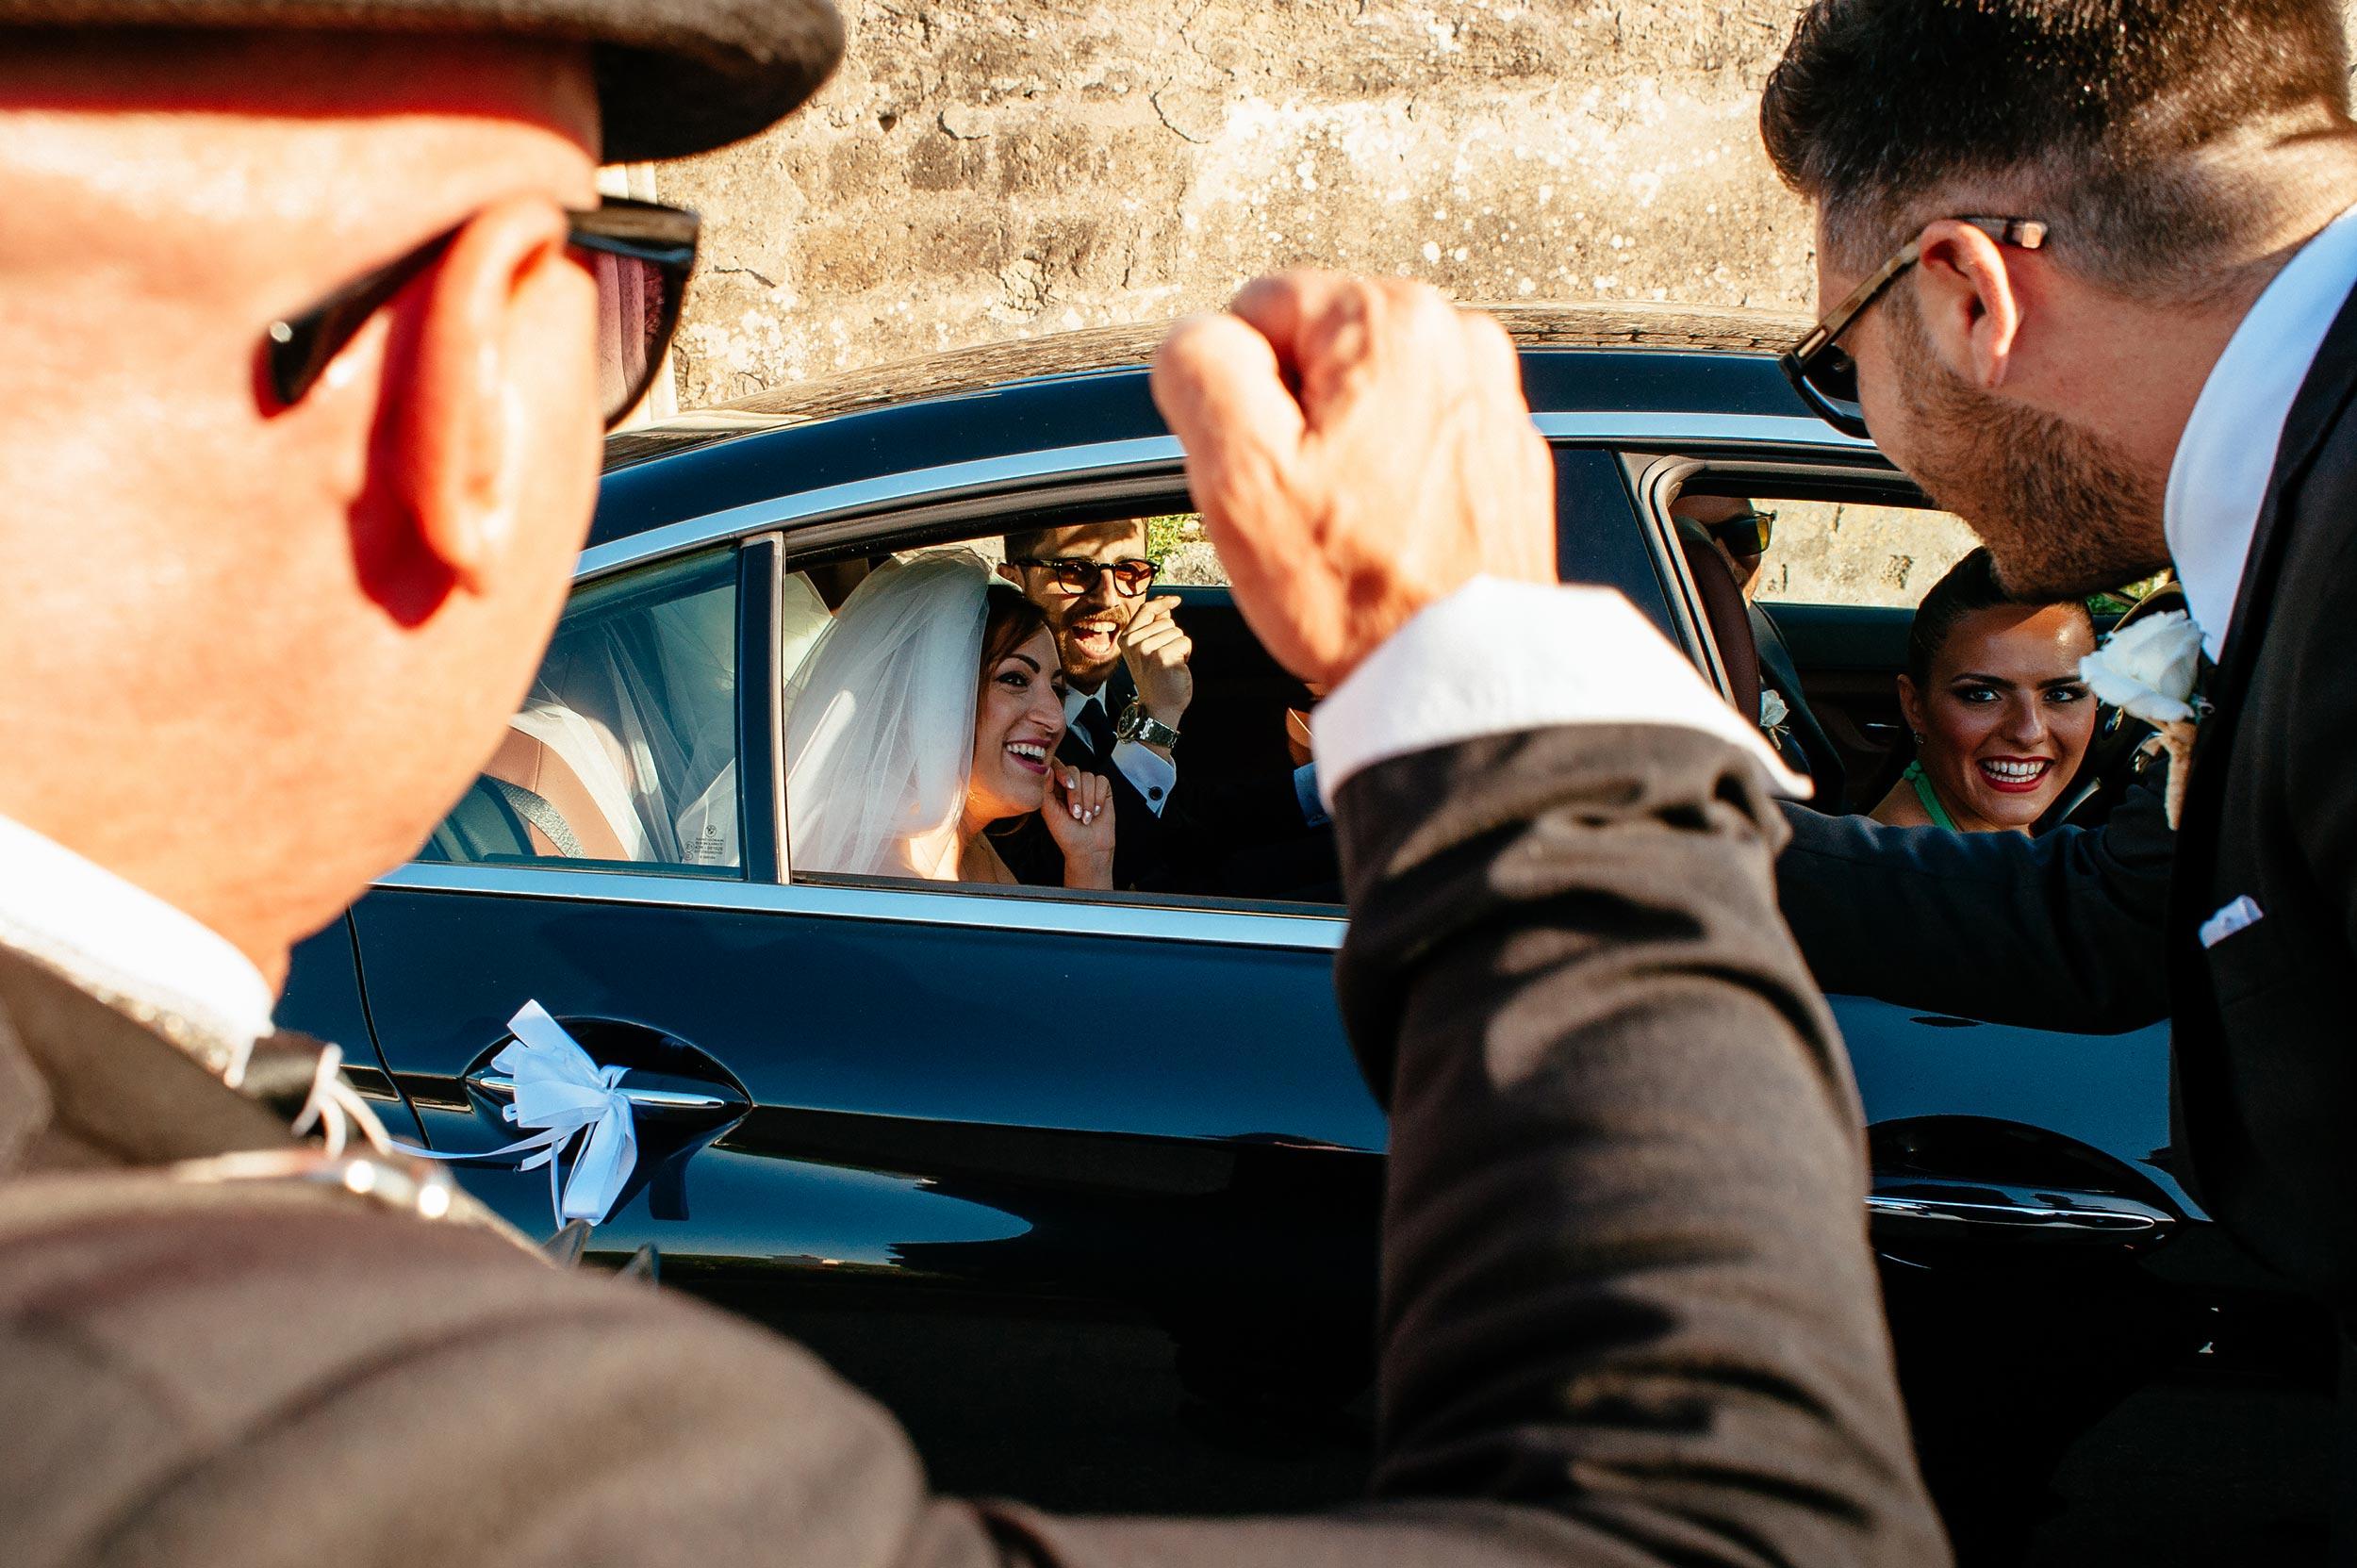 2016-Claudio-Teresa-Naples-Wedding-Photographer-Italy-Alessandro-Avenali-60.jpg